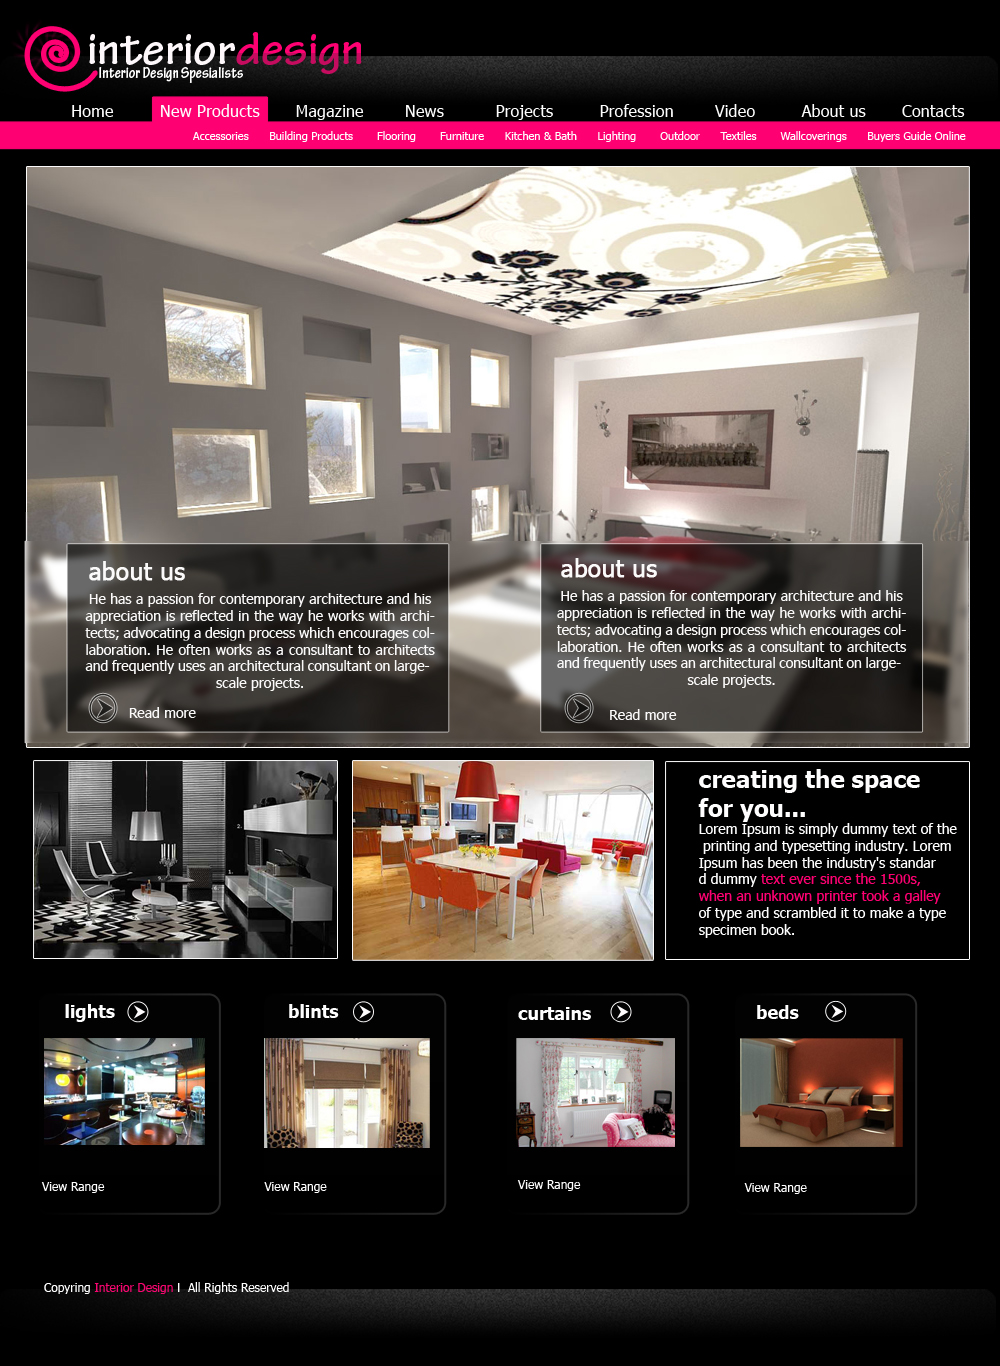 Interior design web template by viktorian on deviantart for Interior design layout templates